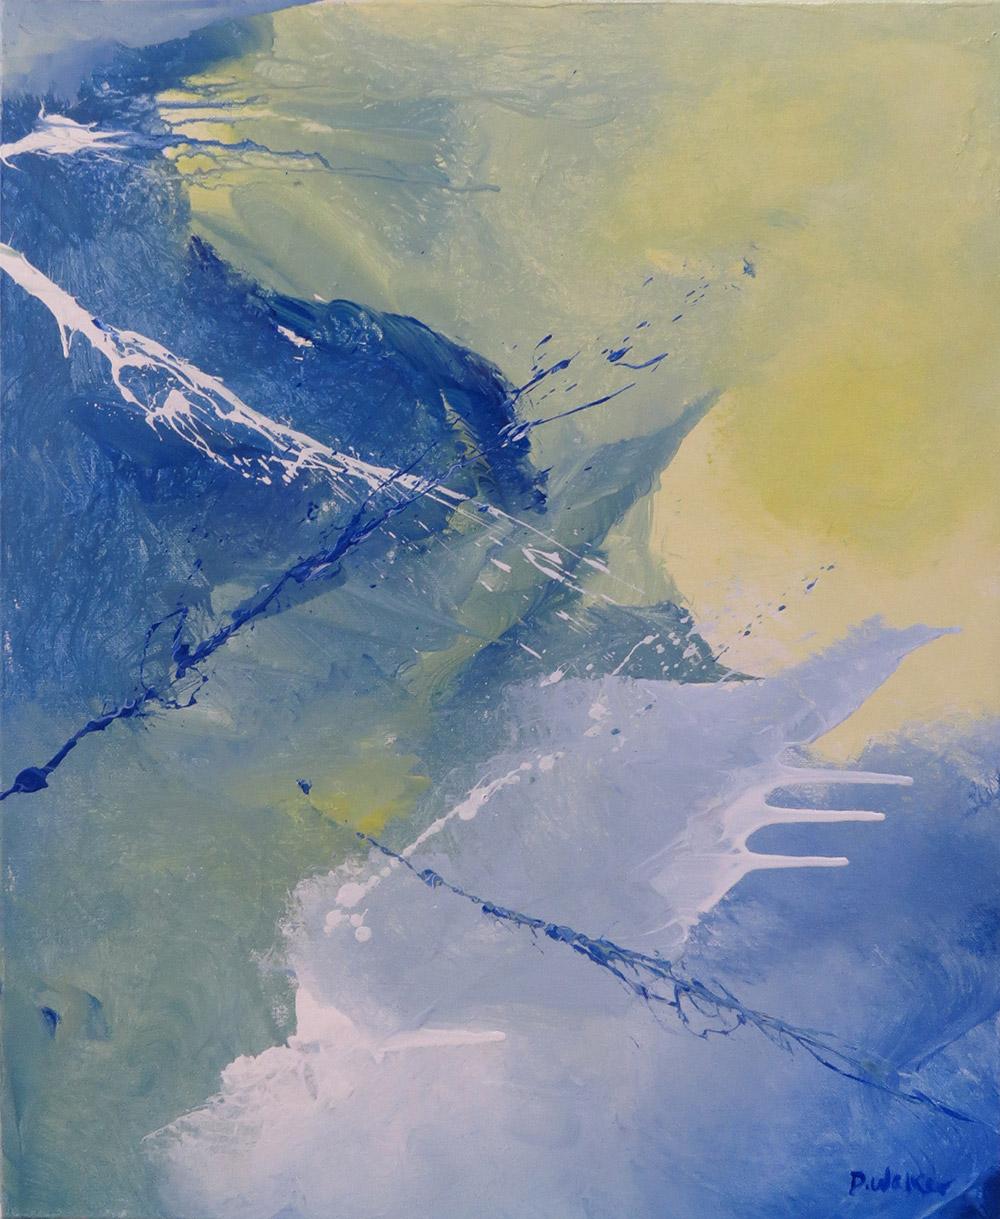 Diane Walker - Making A Splash